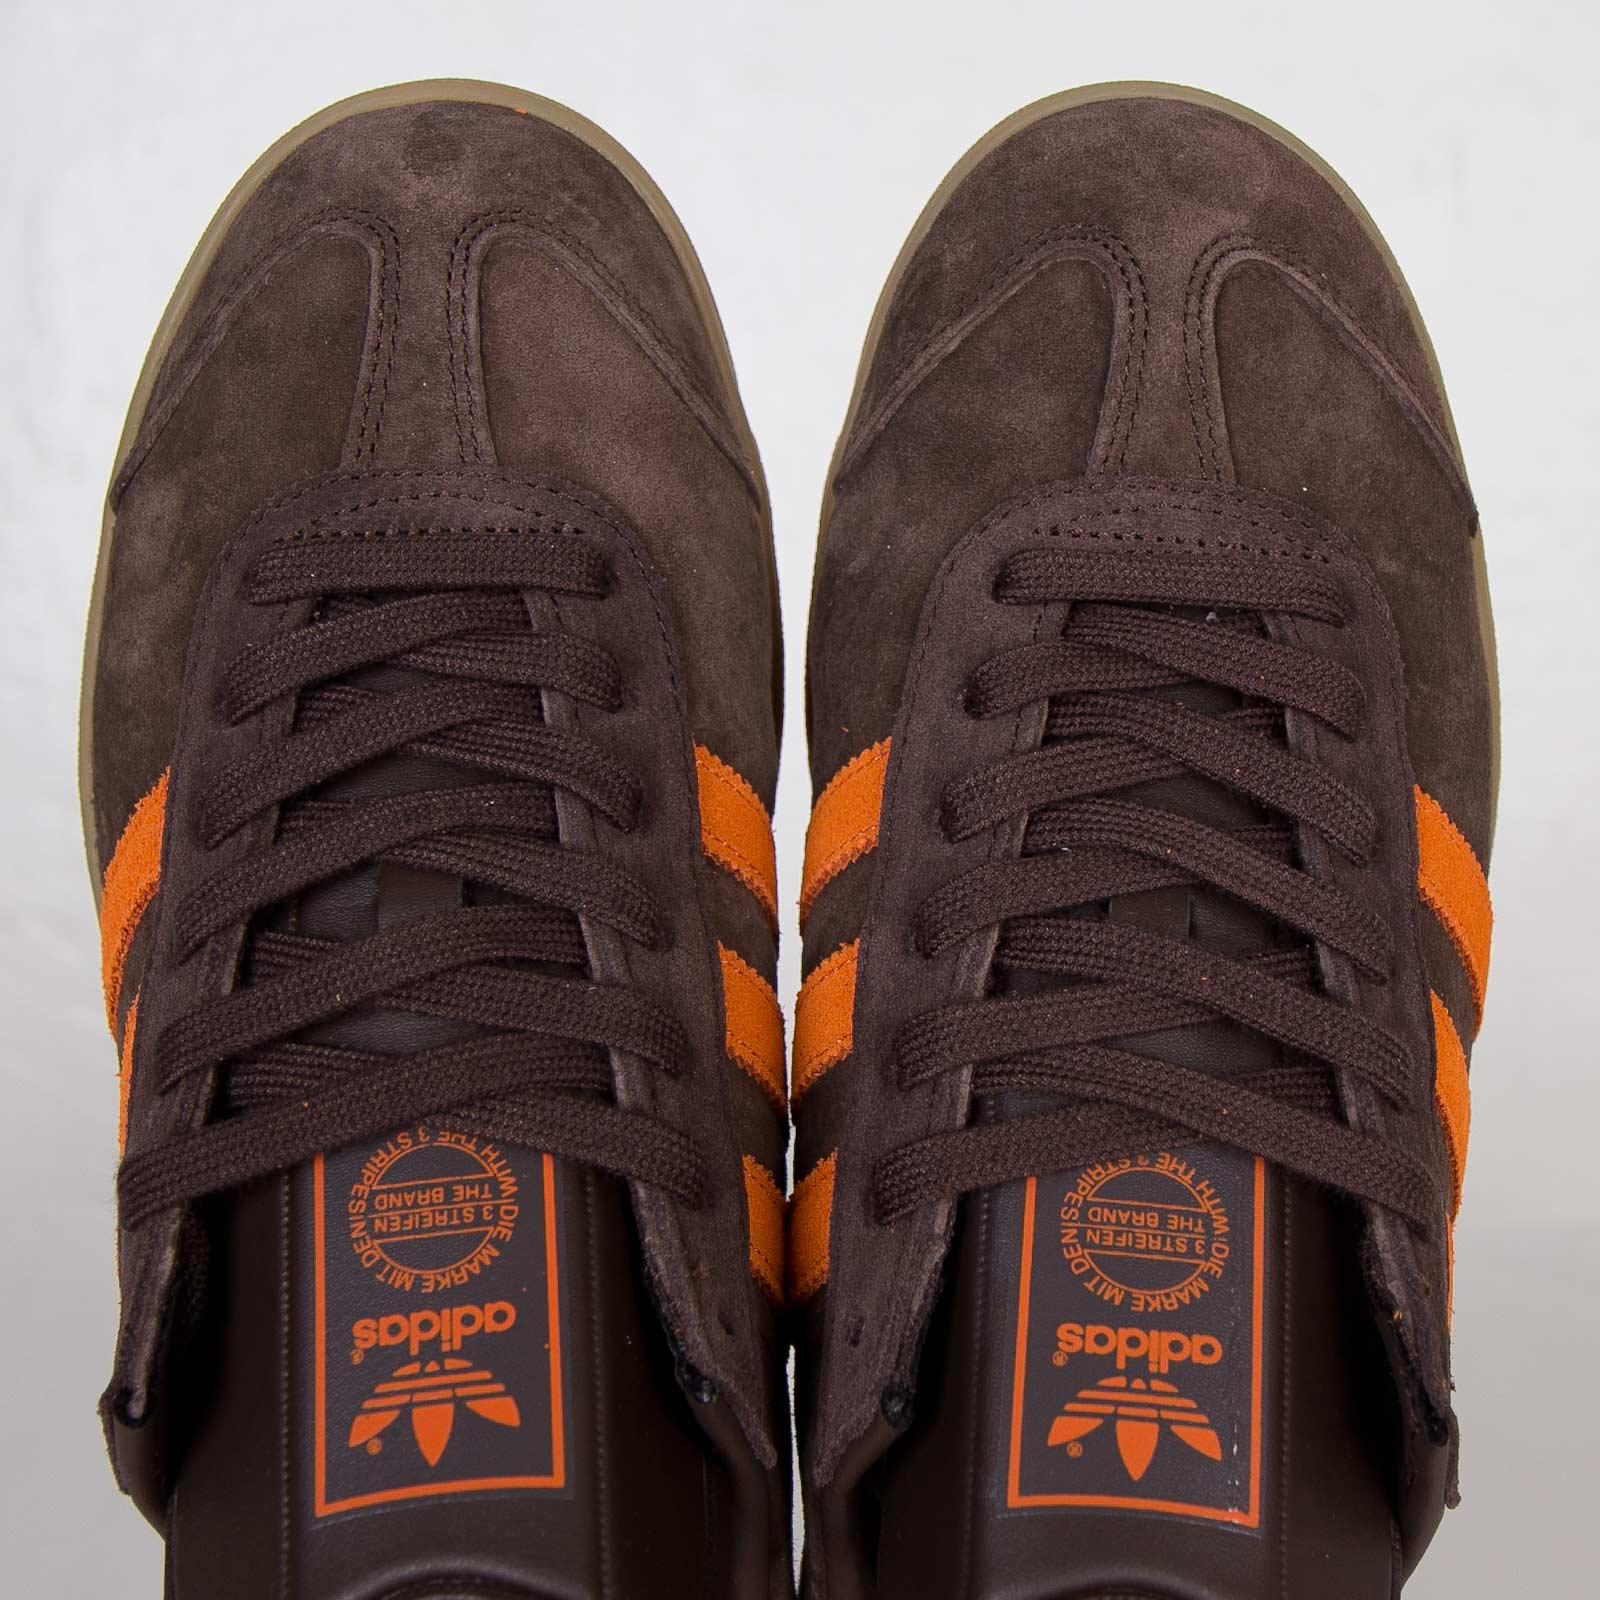 adidas Hamburg - M17308 - SNS   sneakers & streetwear online since ...